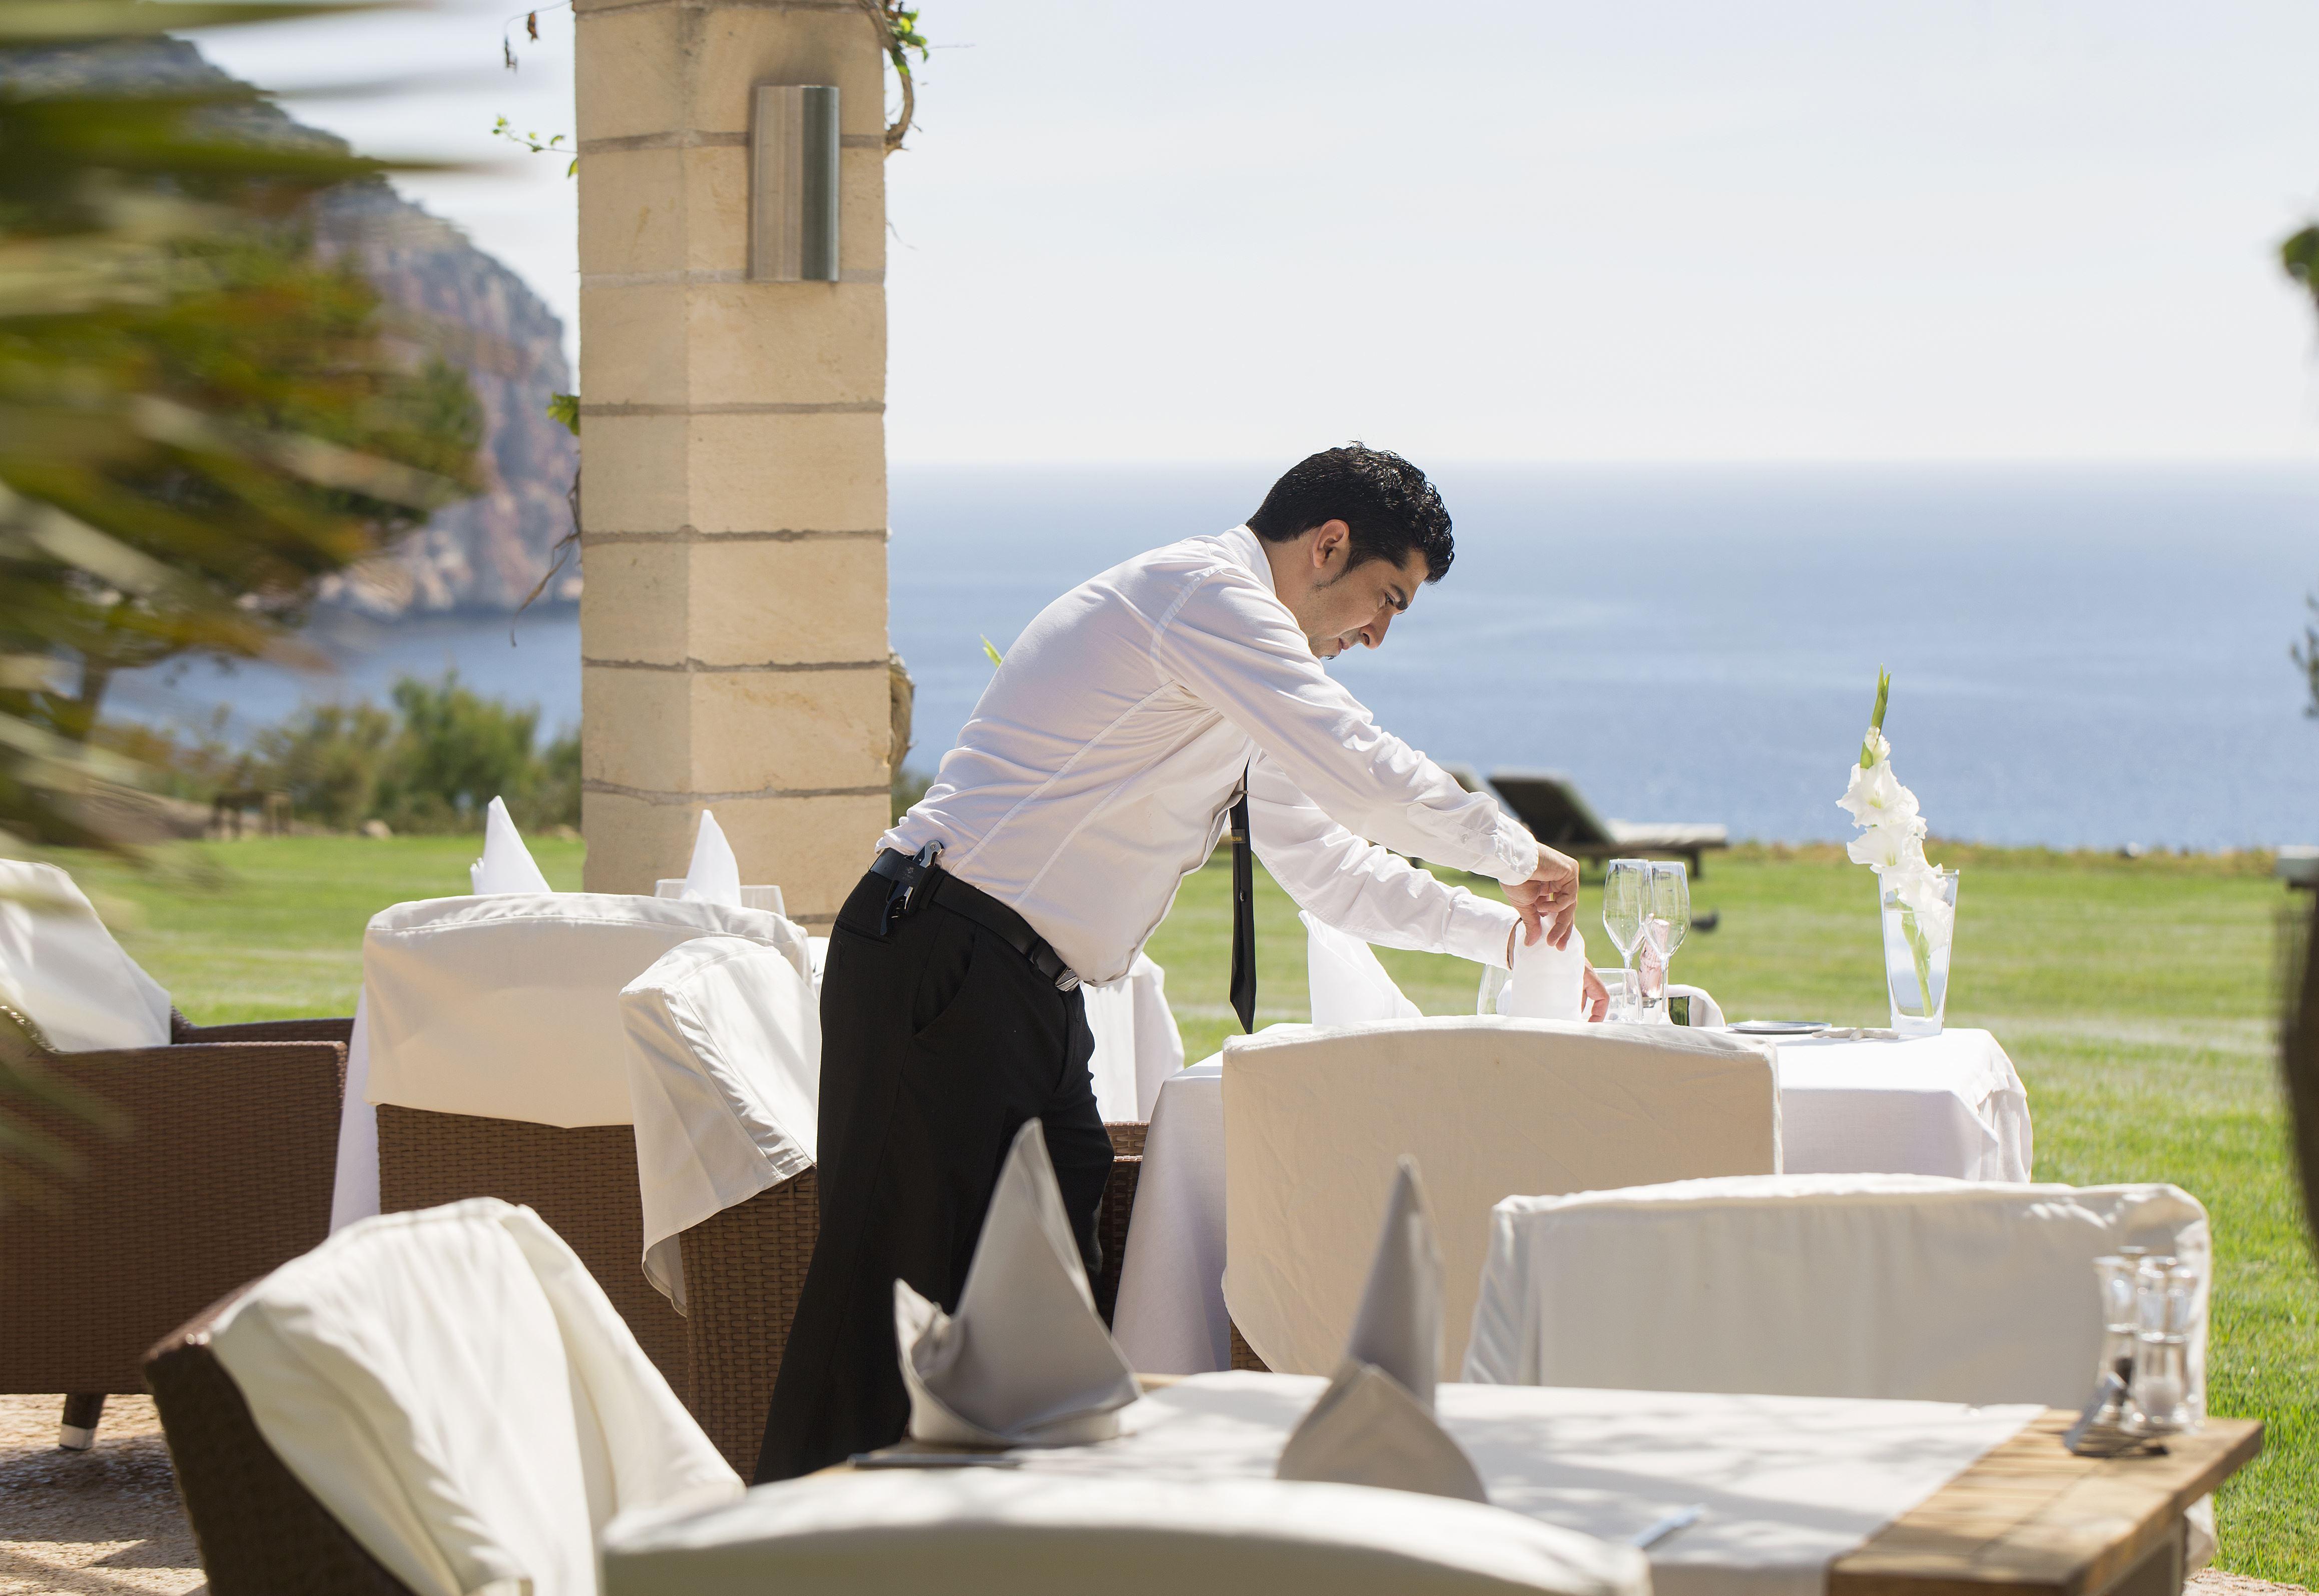 Hotell Can Simoneta: På en klippa med fantastisk utsikt över havet